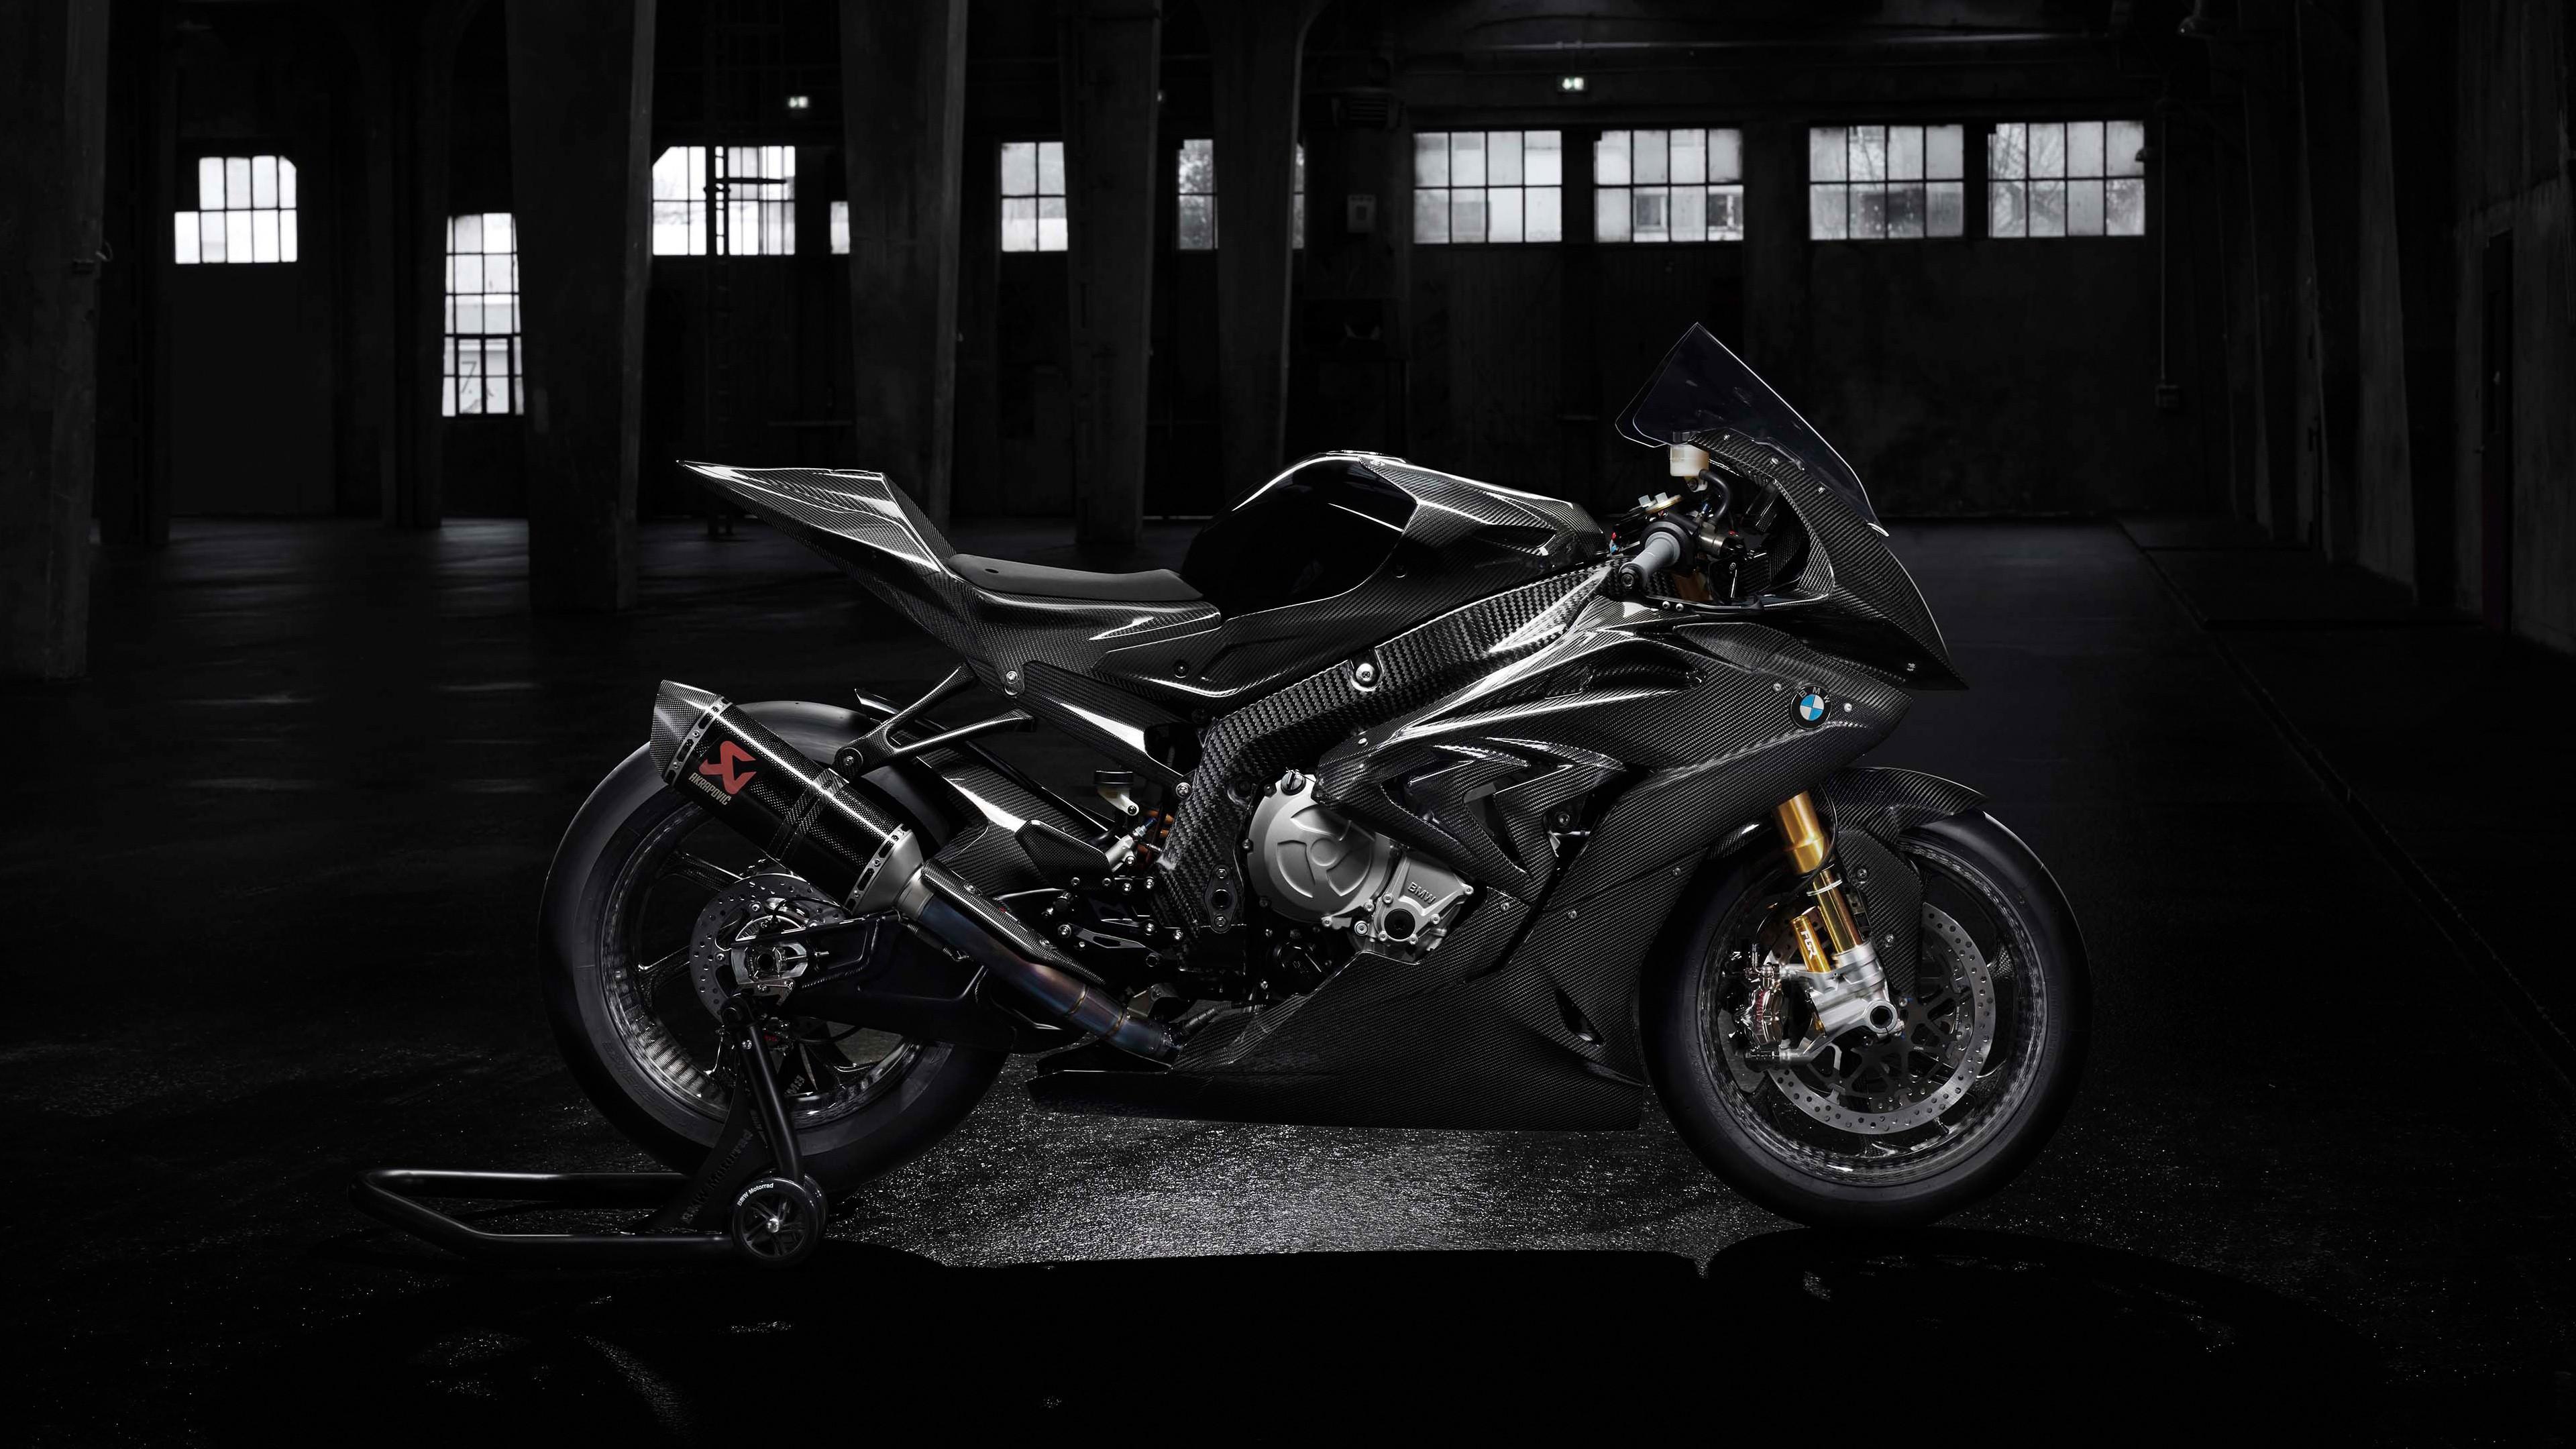 bmw motorcycle race hp4 bikes wallpapers motocycles desktop